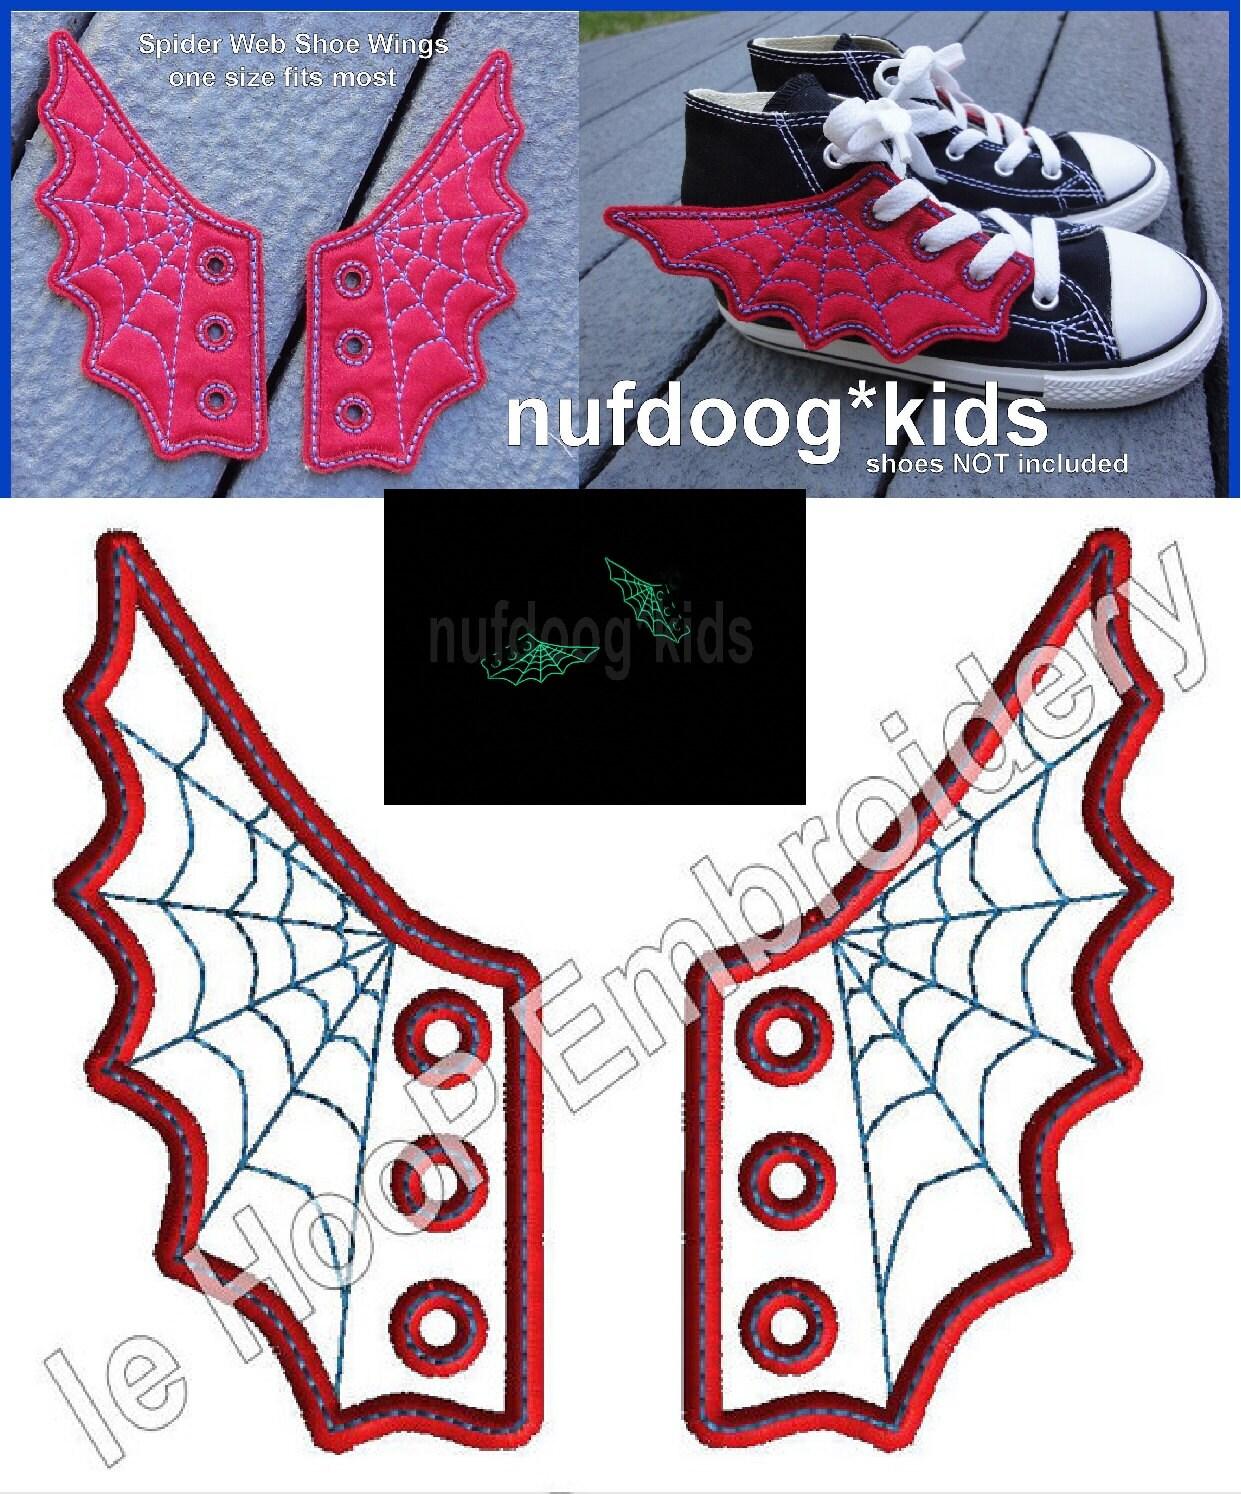 Spider web shoe wings machine embroidery in hoop